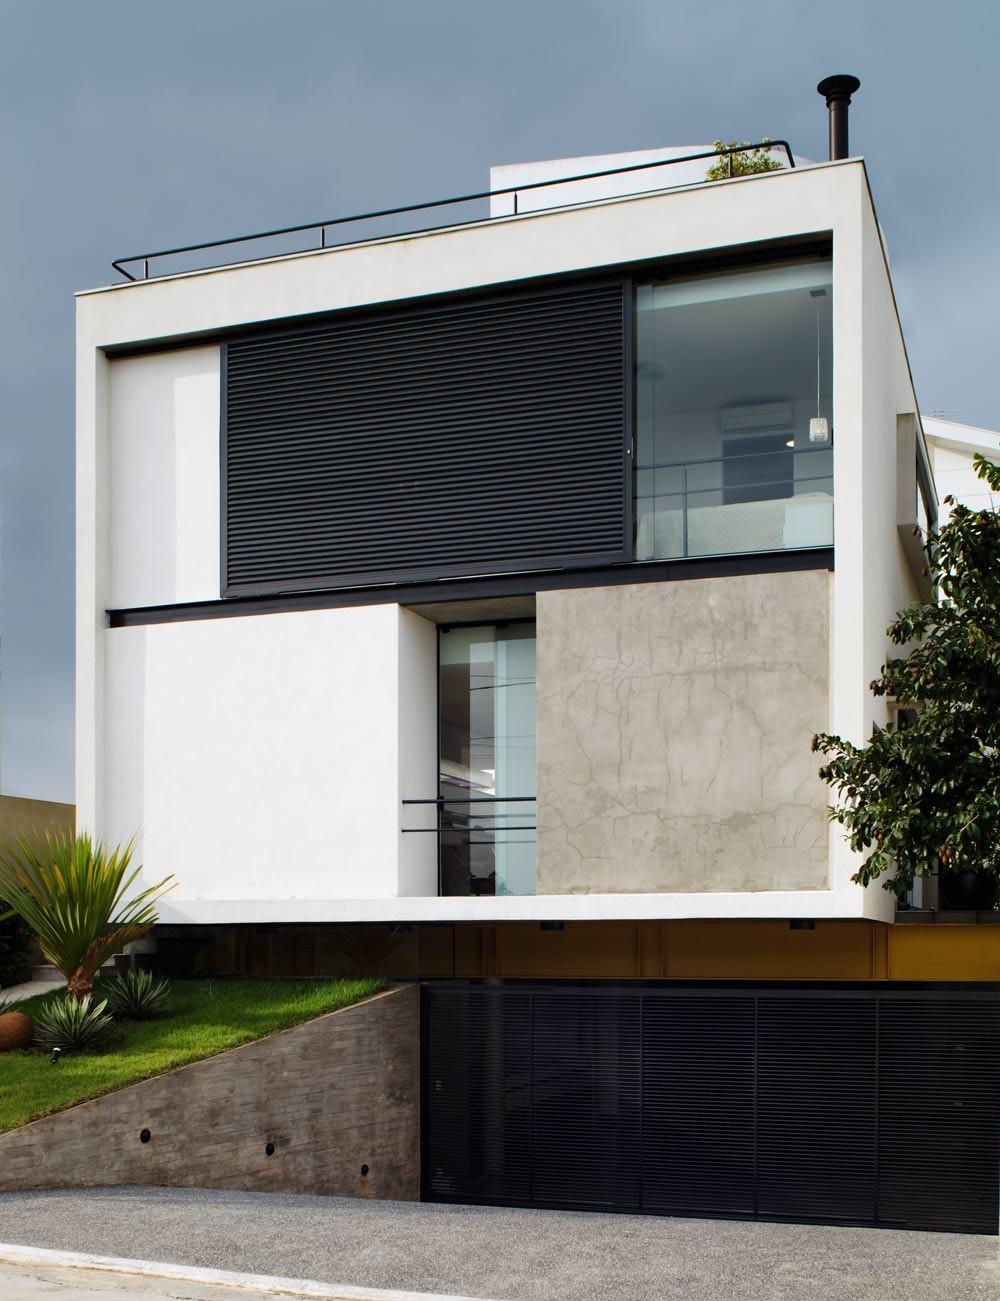 Gallery Of Mirante Do Horto House Flavio Castro 23